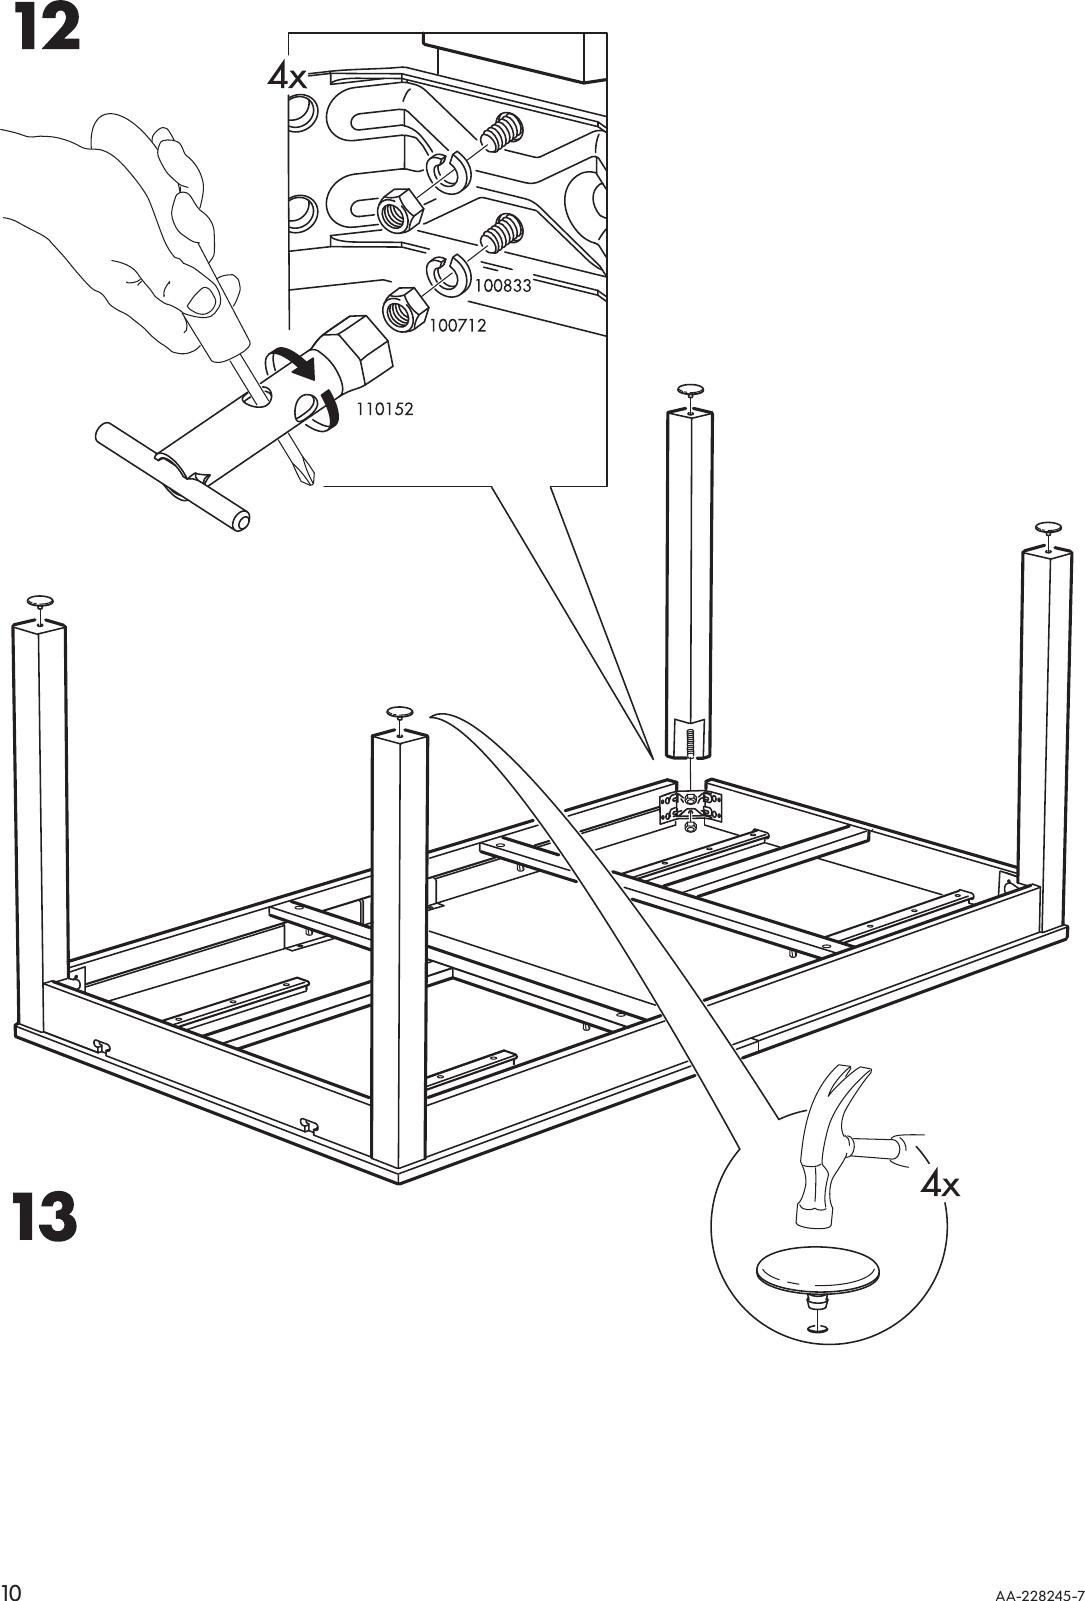 Ikea Bjursta Extendable Dining Table 69 86 102 X37